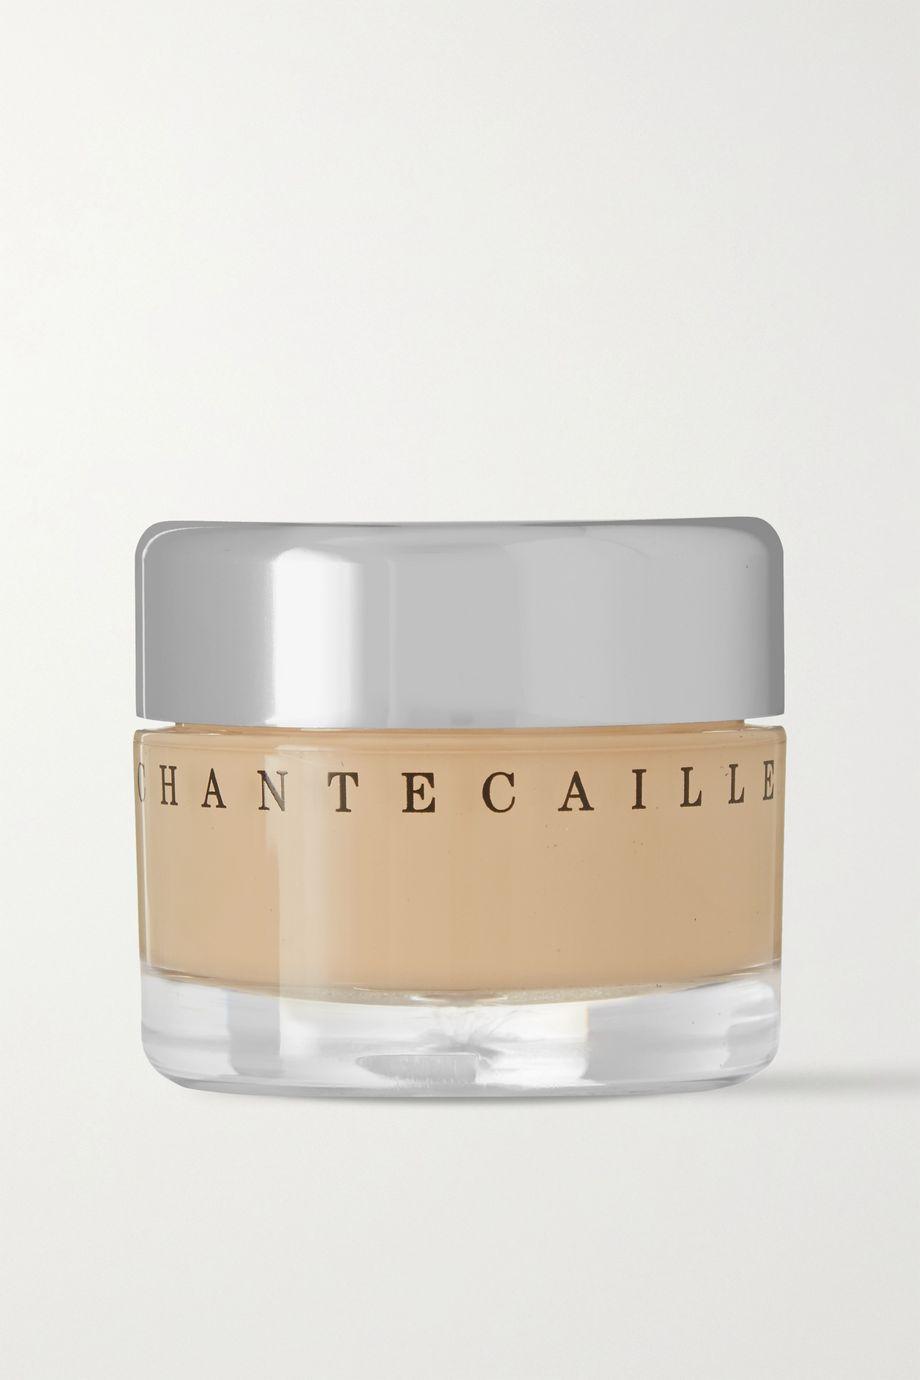 Chantecaille Future Skin Oil Free Gel Foundation - Cream, 30g